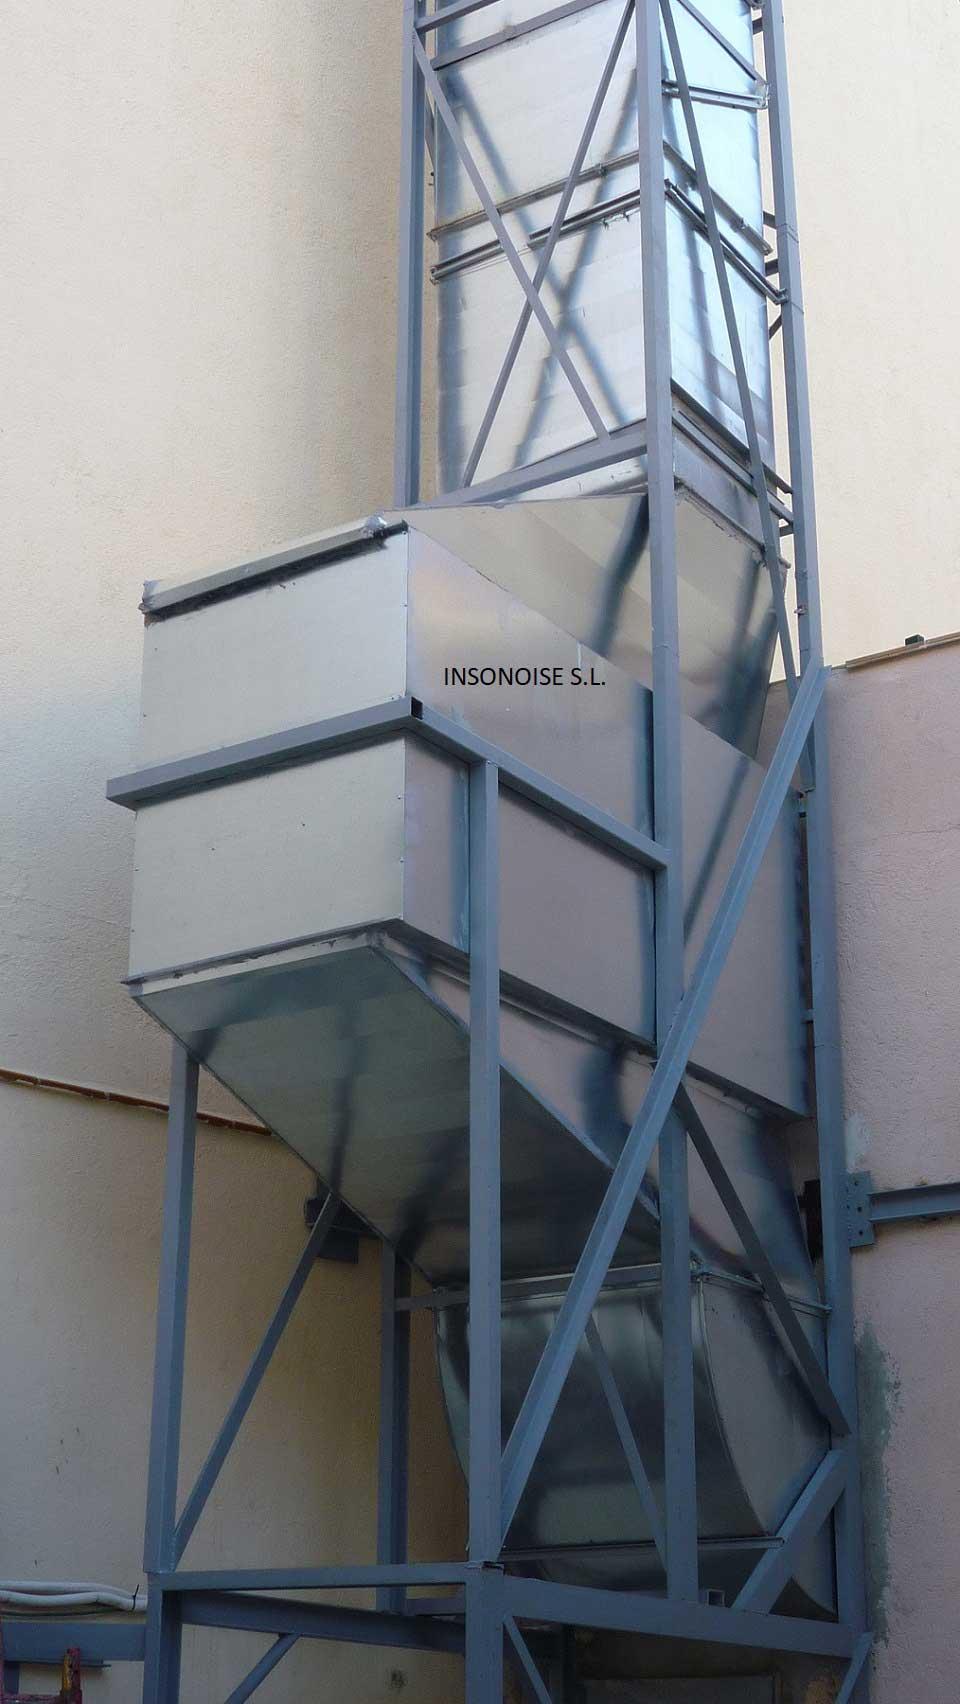 Instalación de silenciadores acústicos en Pozuelo de Alarcón